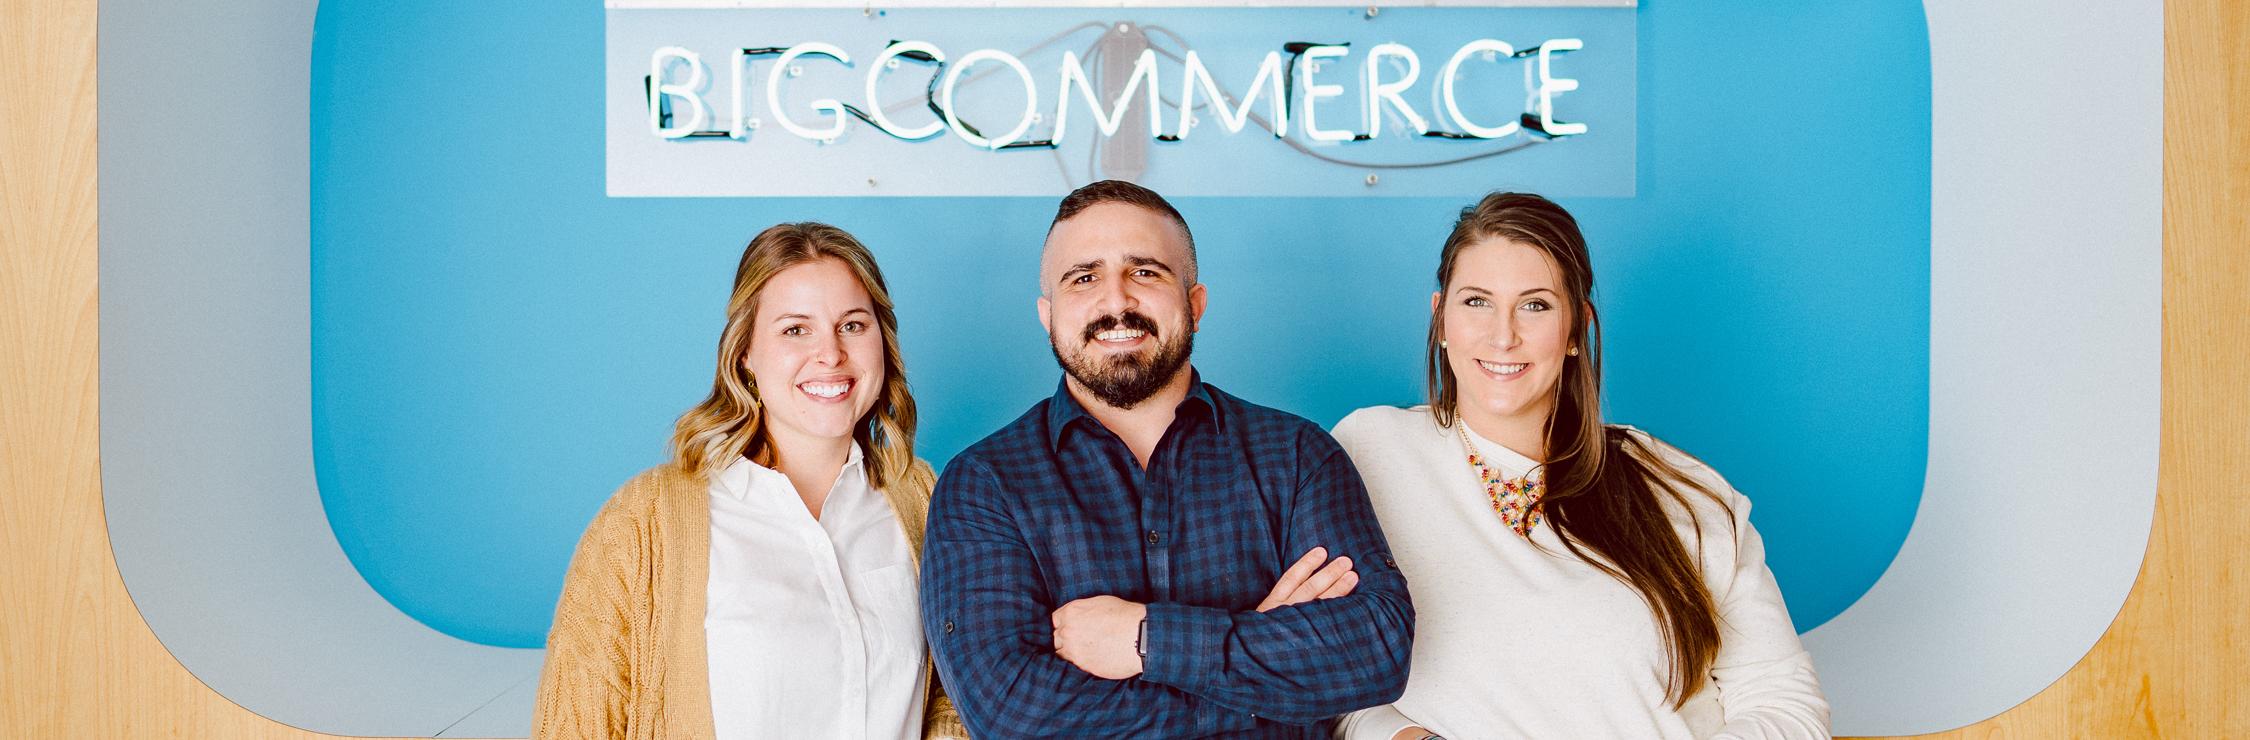 Ecommerce Website Launch Services